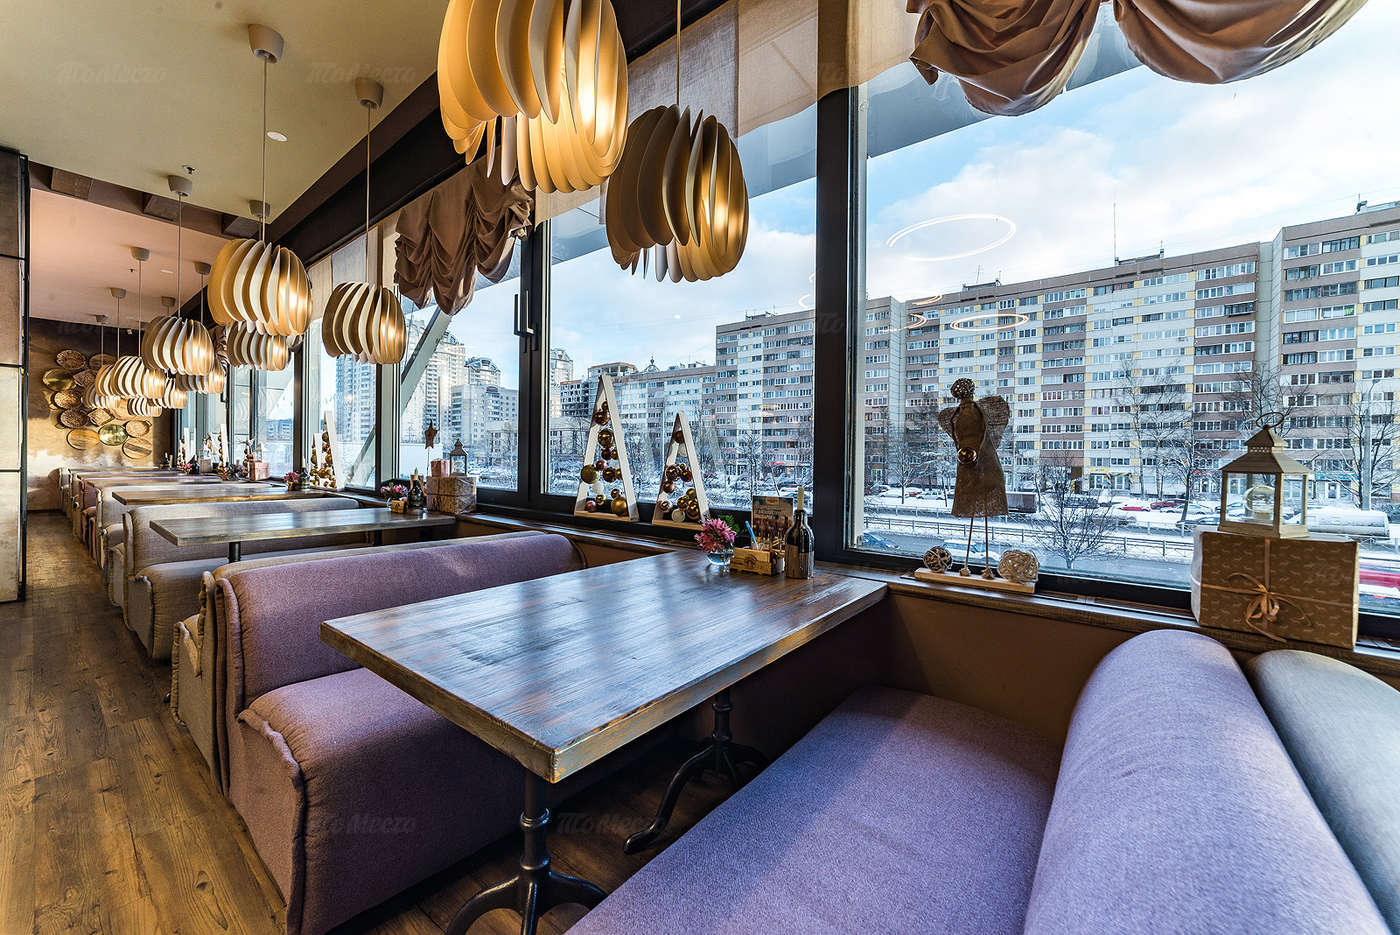 Ресторан Шато Винтаж (Chateau Vintage) на проспекте Энгельса фото 6